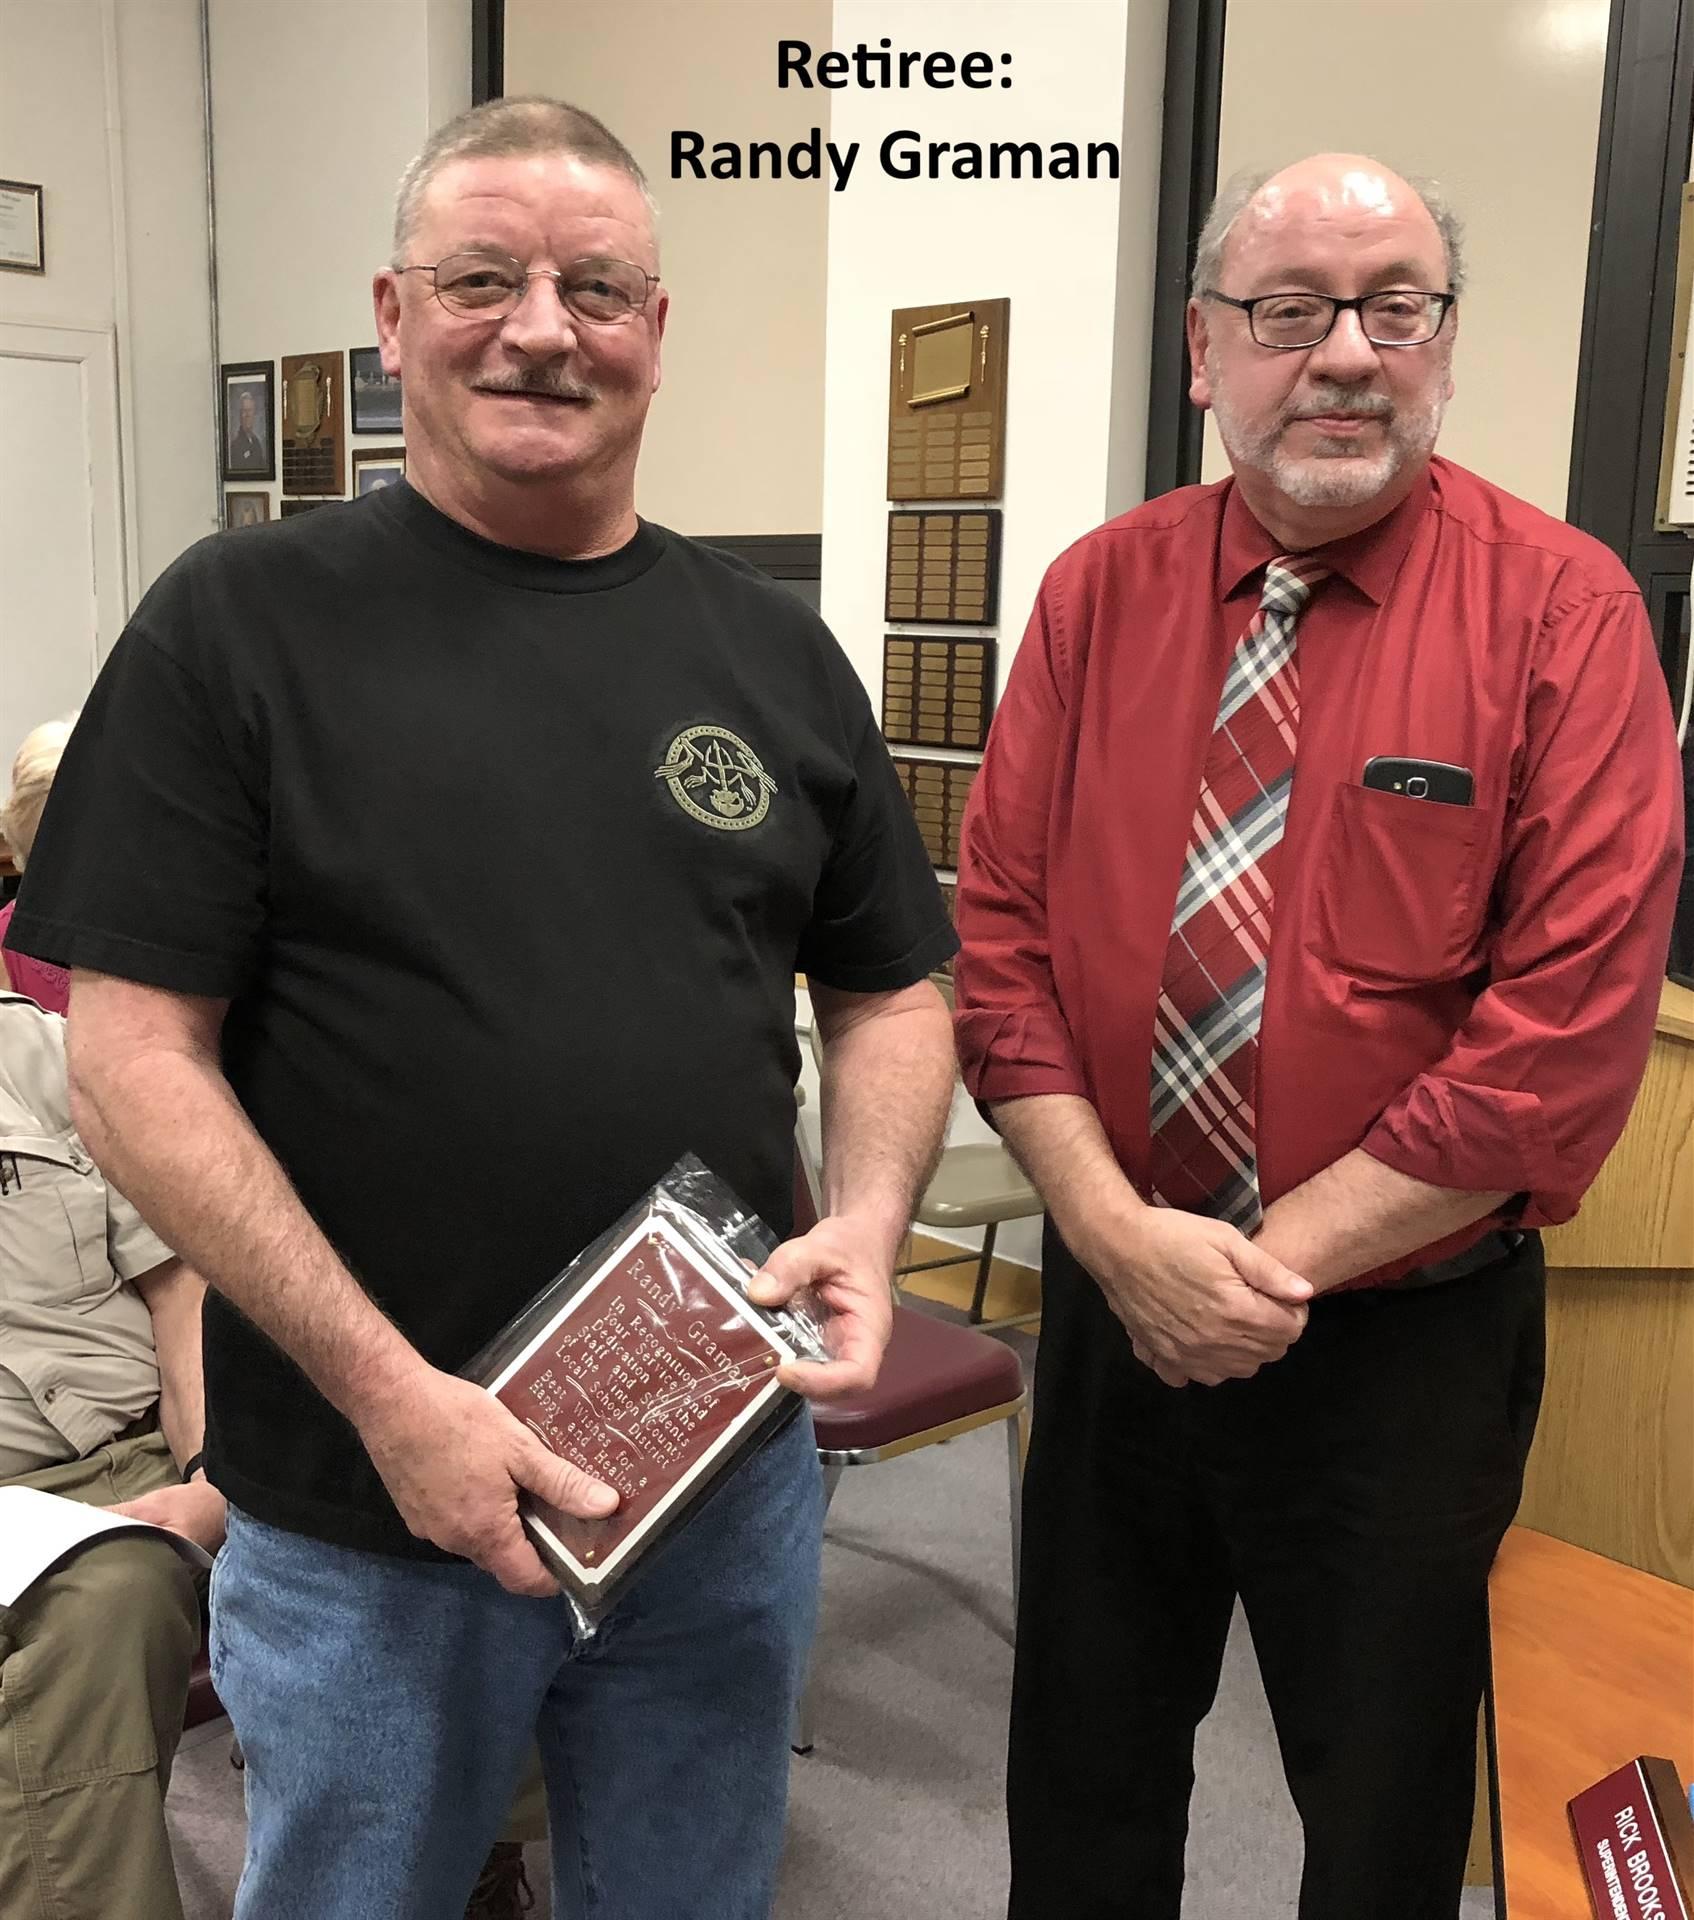 Retiree:  Randy Graman